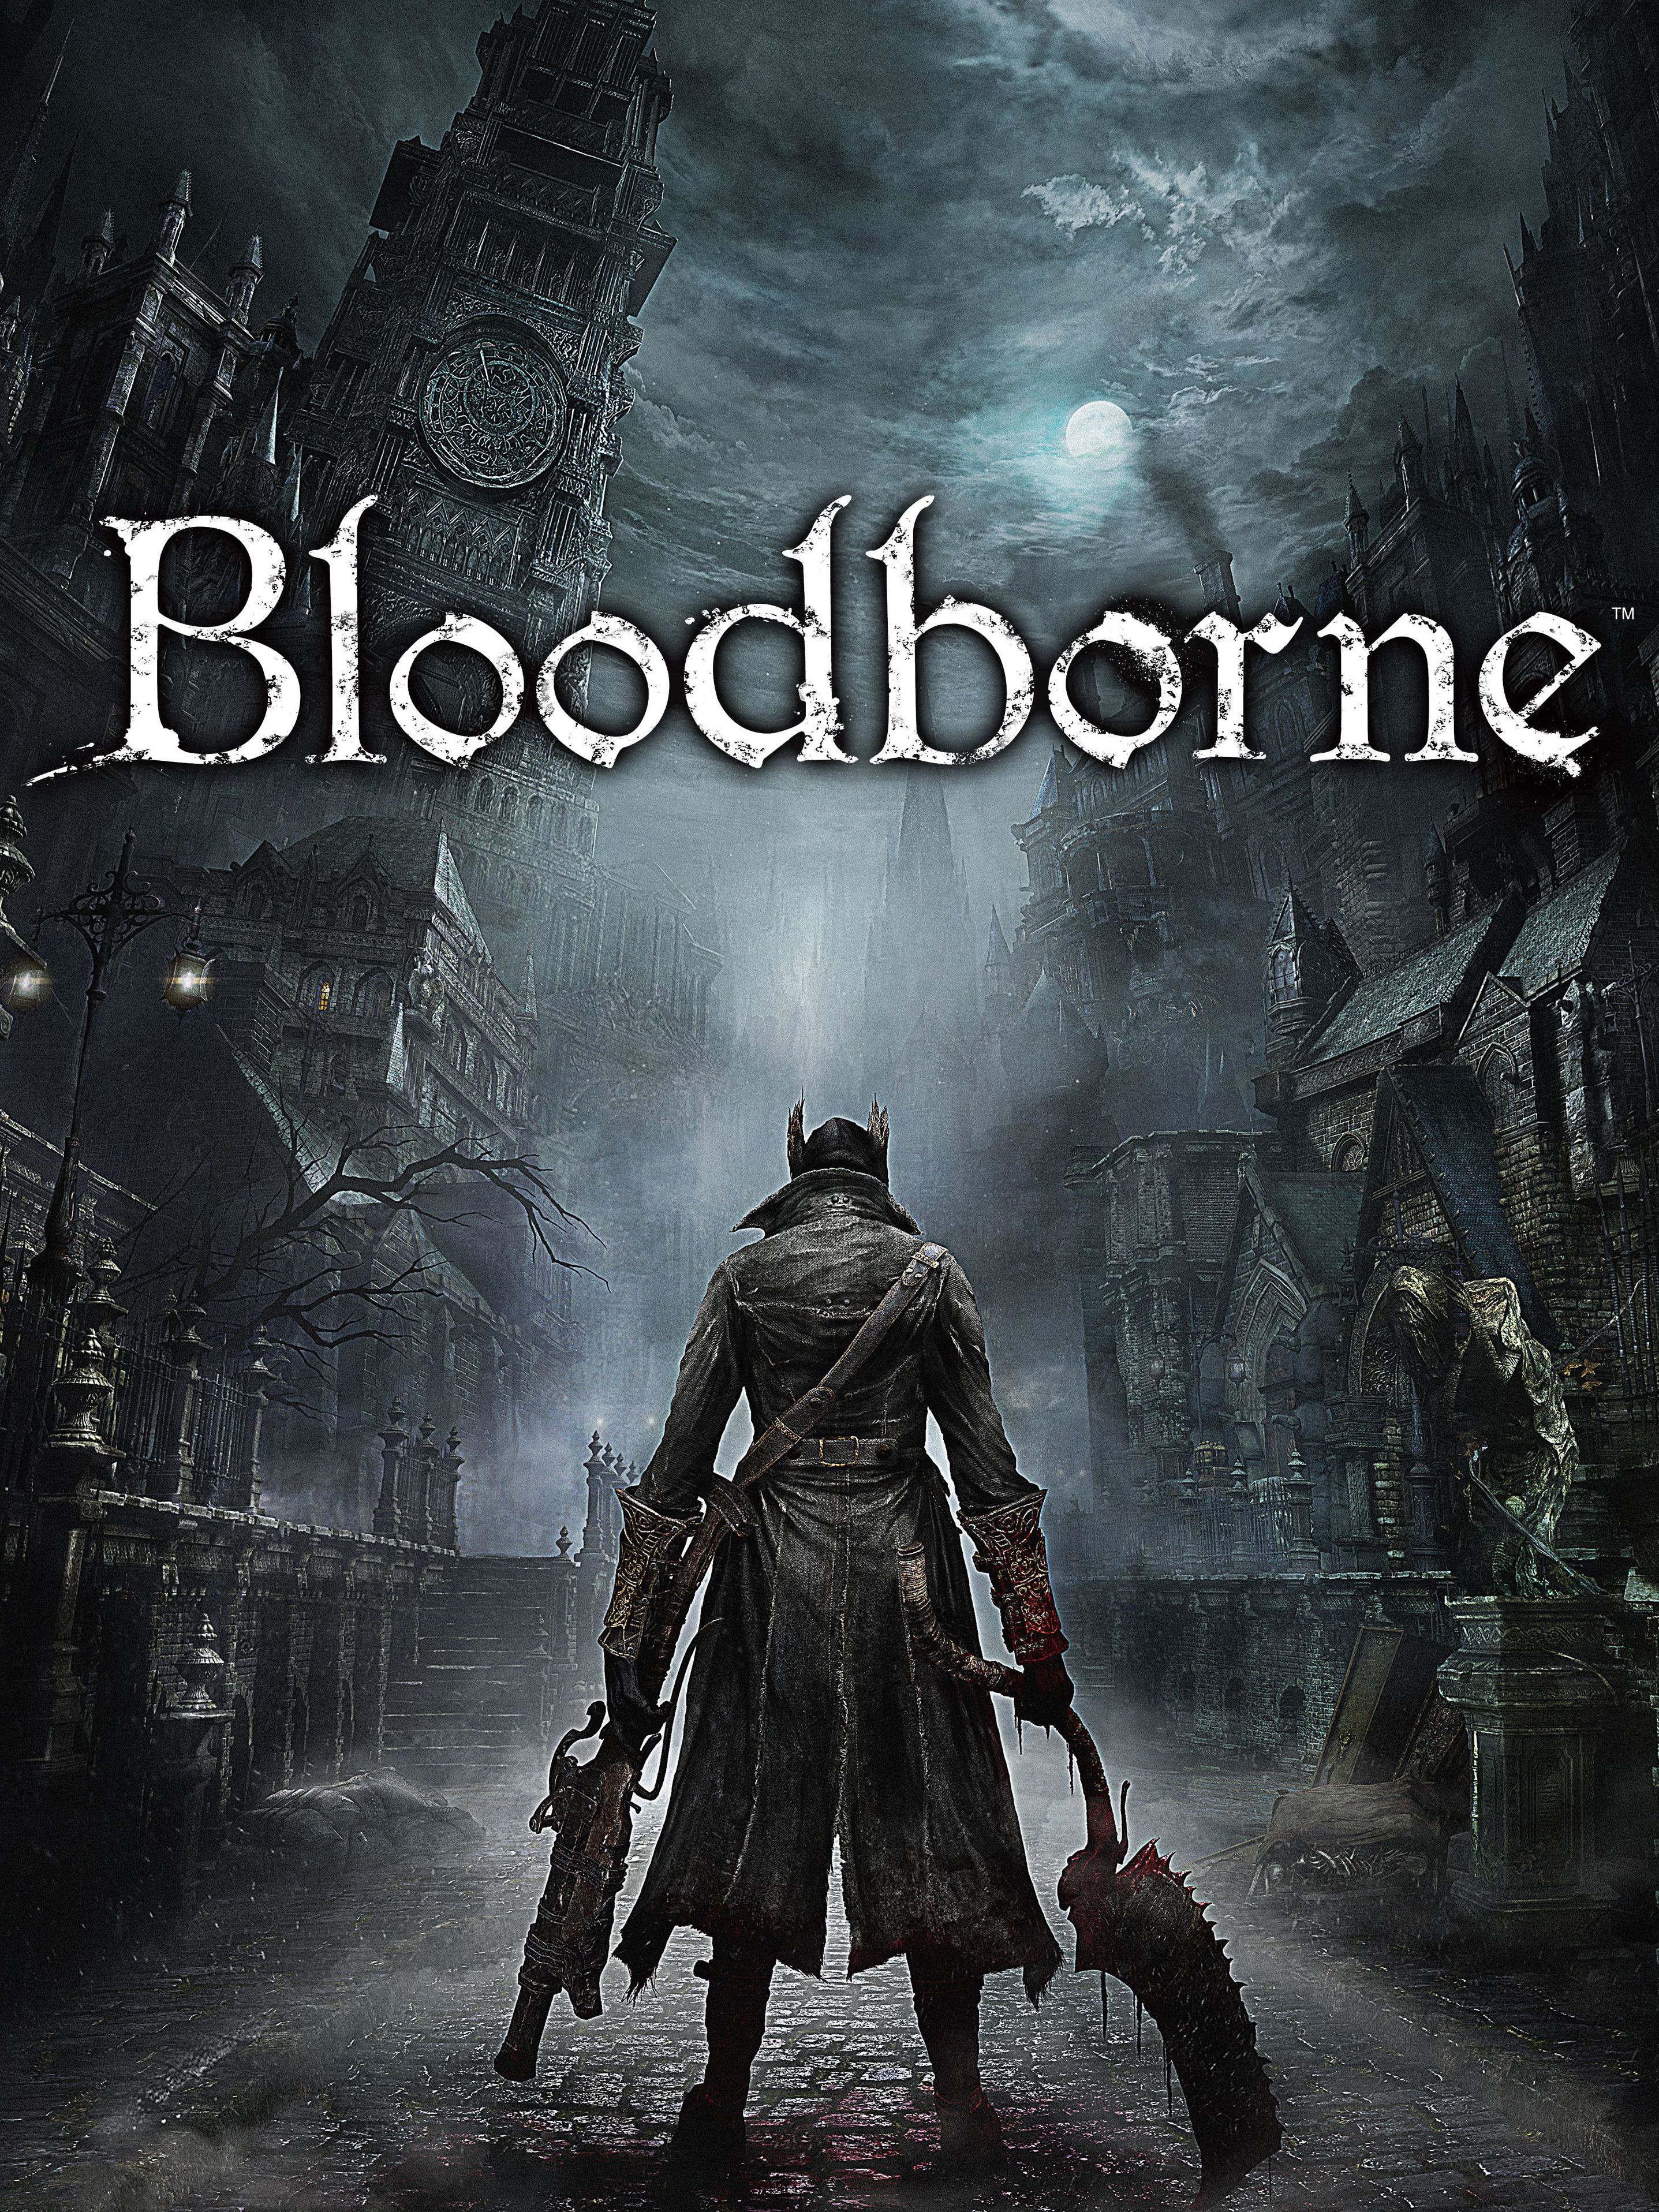 Bloodborne (Video Game 2015) - IMDb